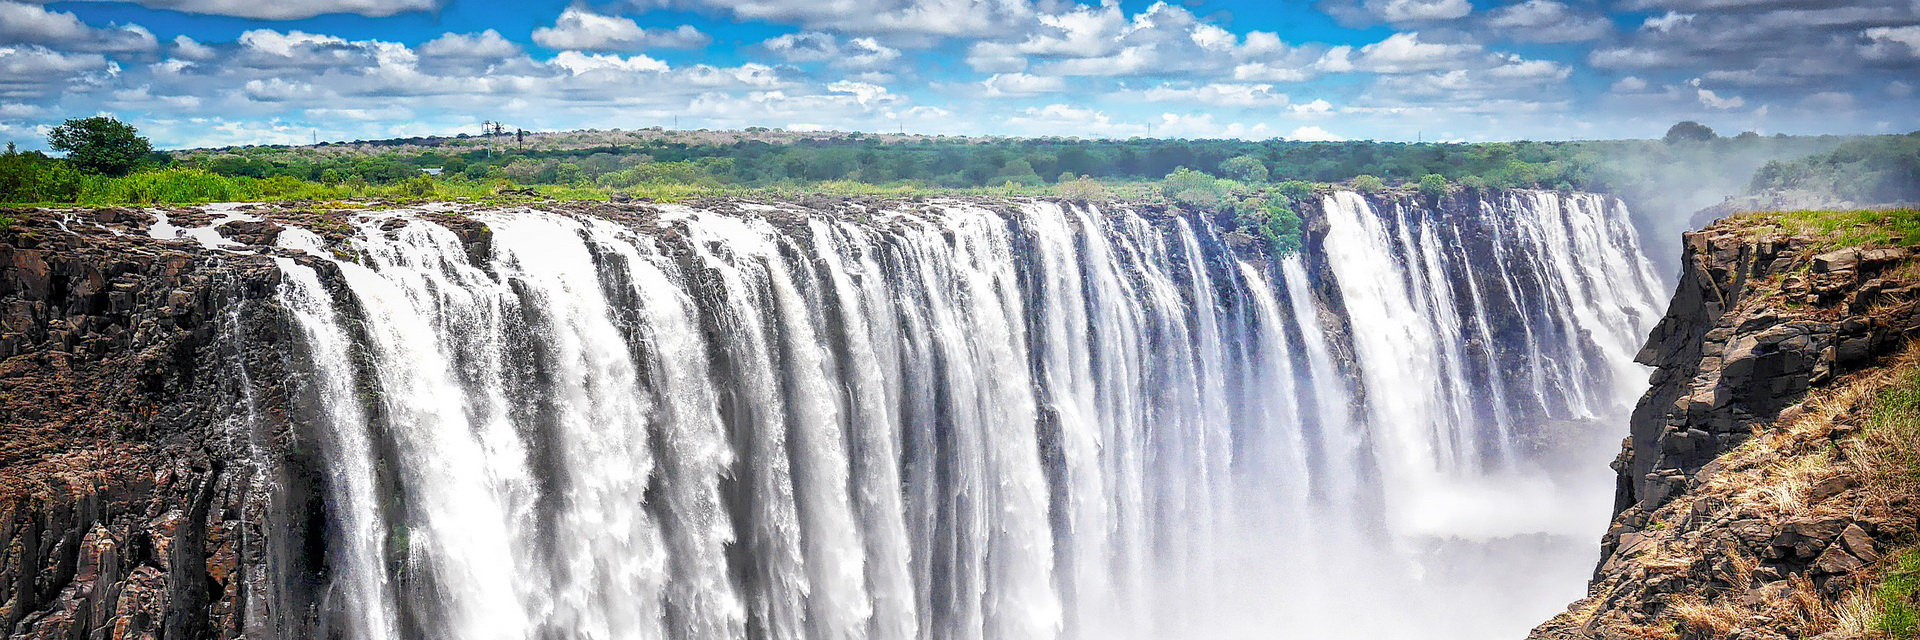 Victoria Falls – The Smoke That Thunders